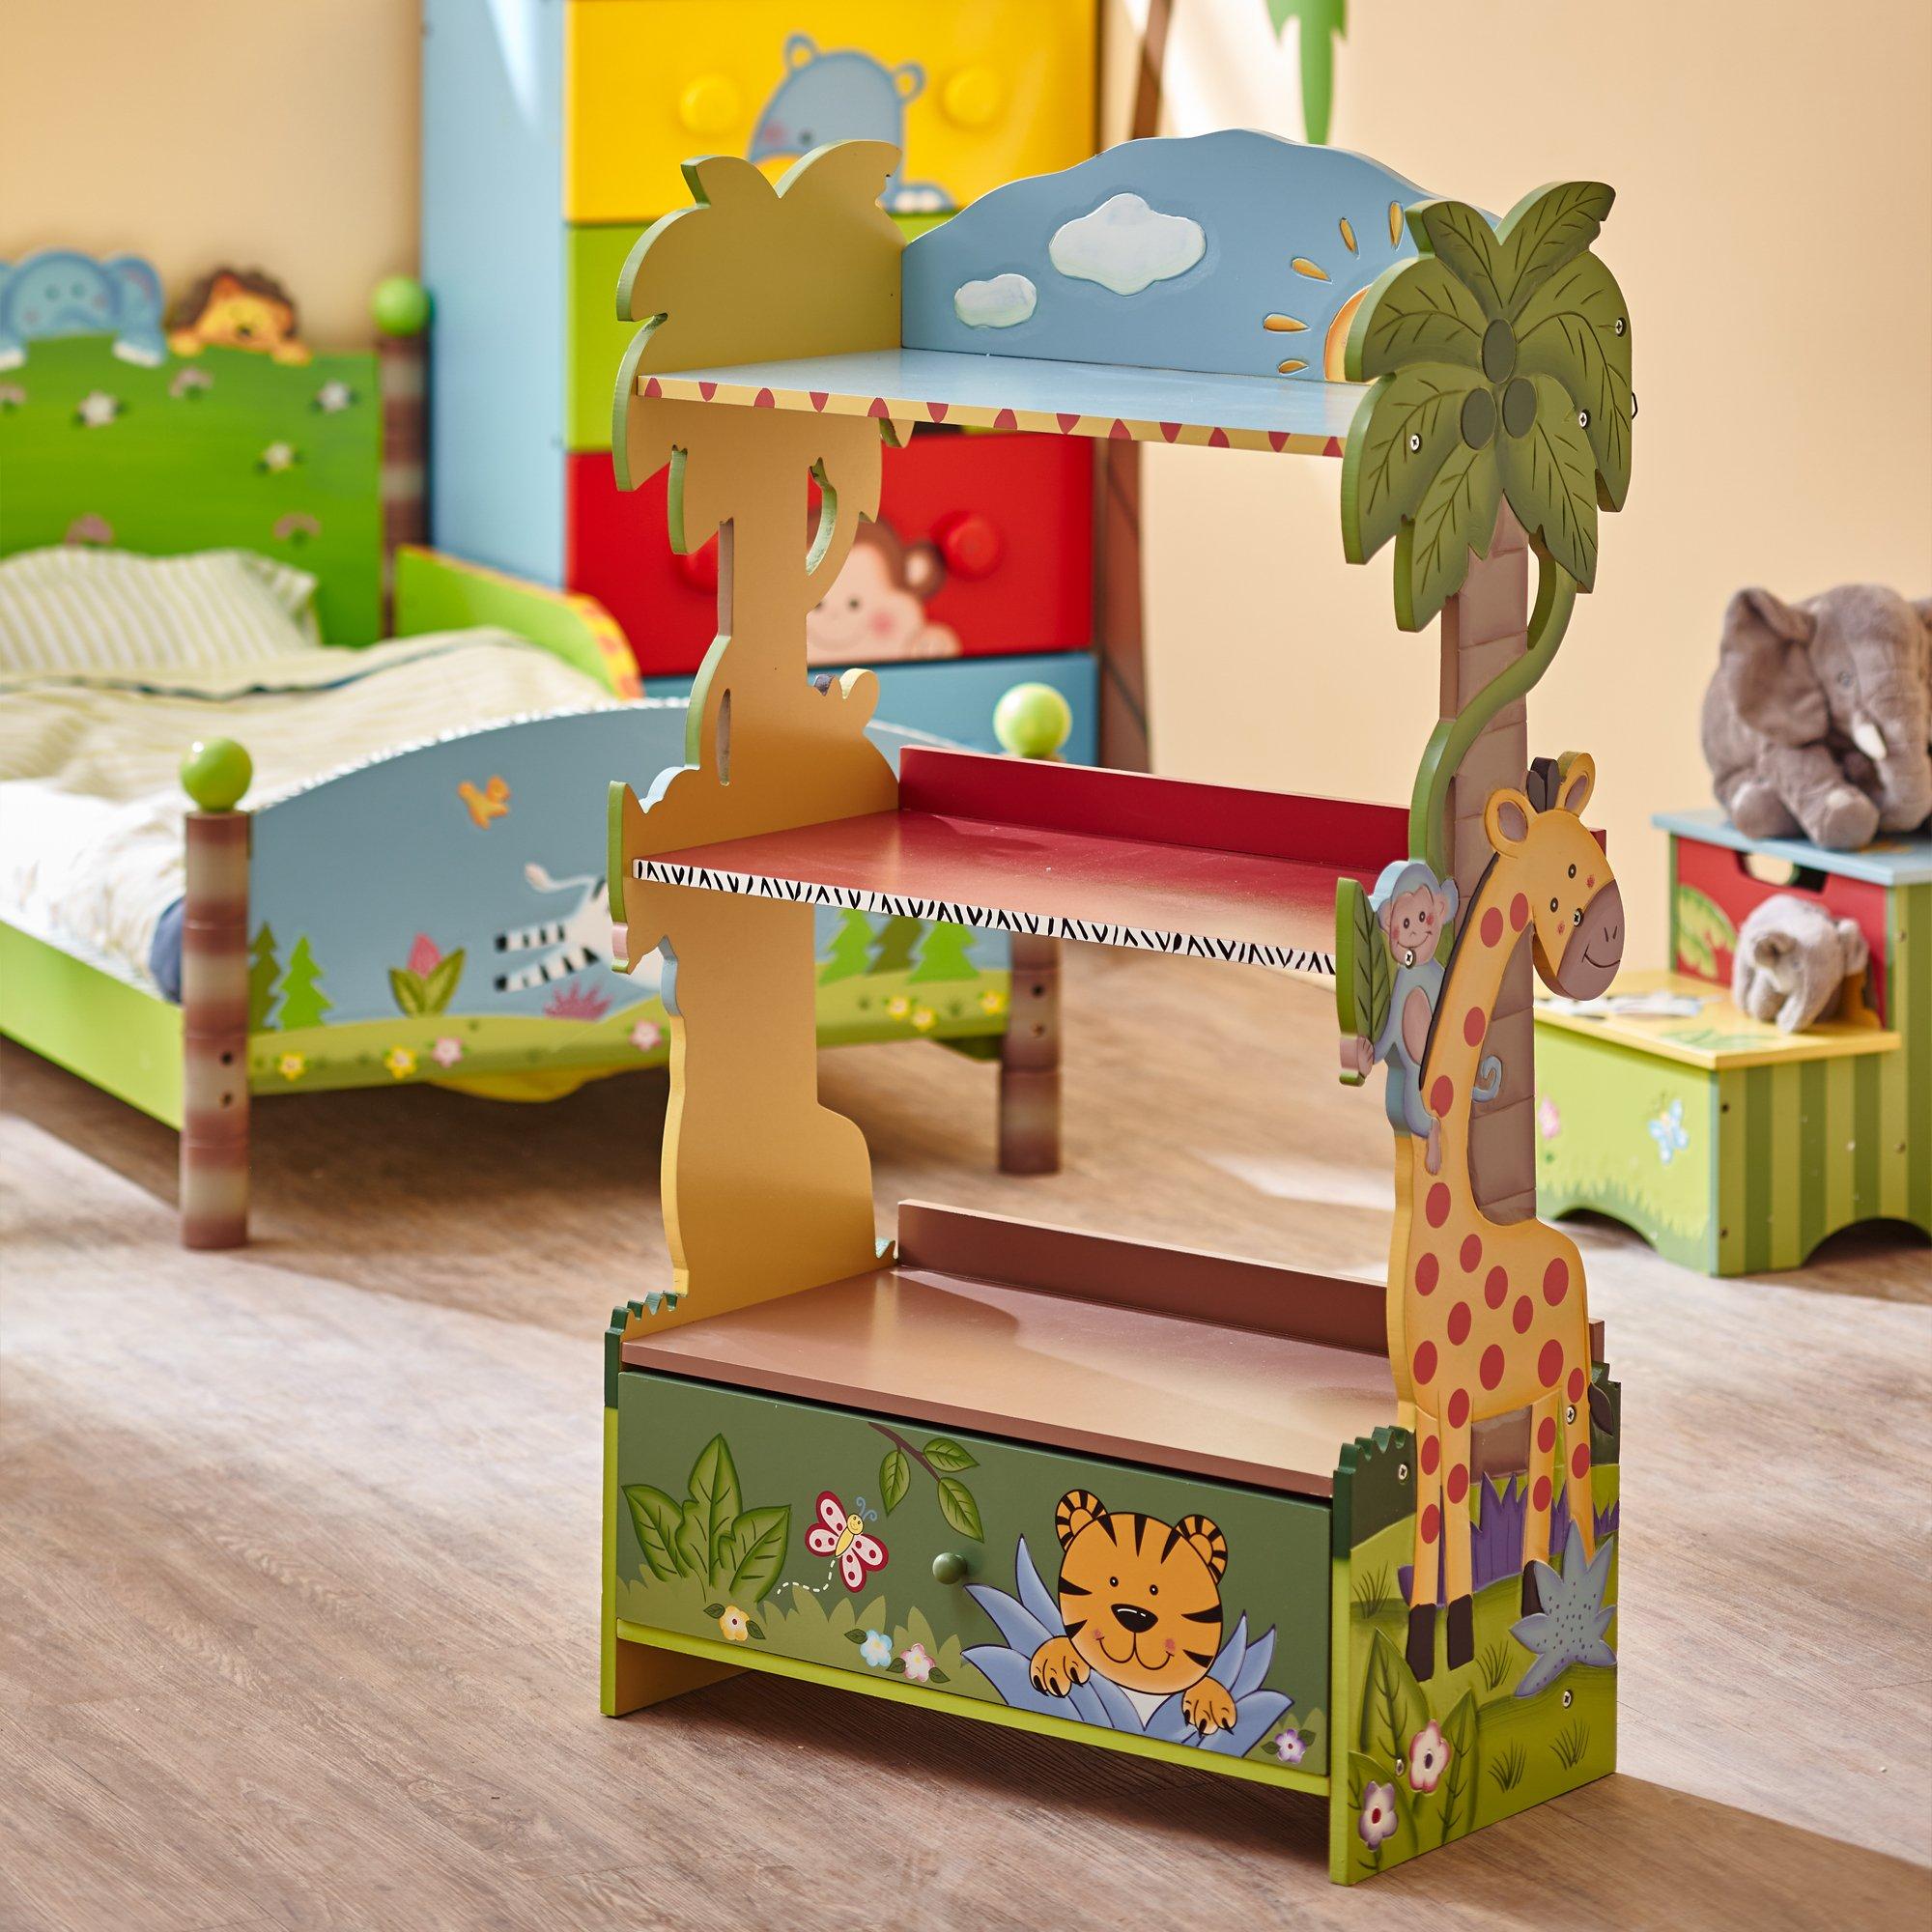 Fantasy Fields - Sunny Safari Wooden Kids Bookshelf with Hand Crafted Designs & Toy Storage - Green by Fantasy Fields